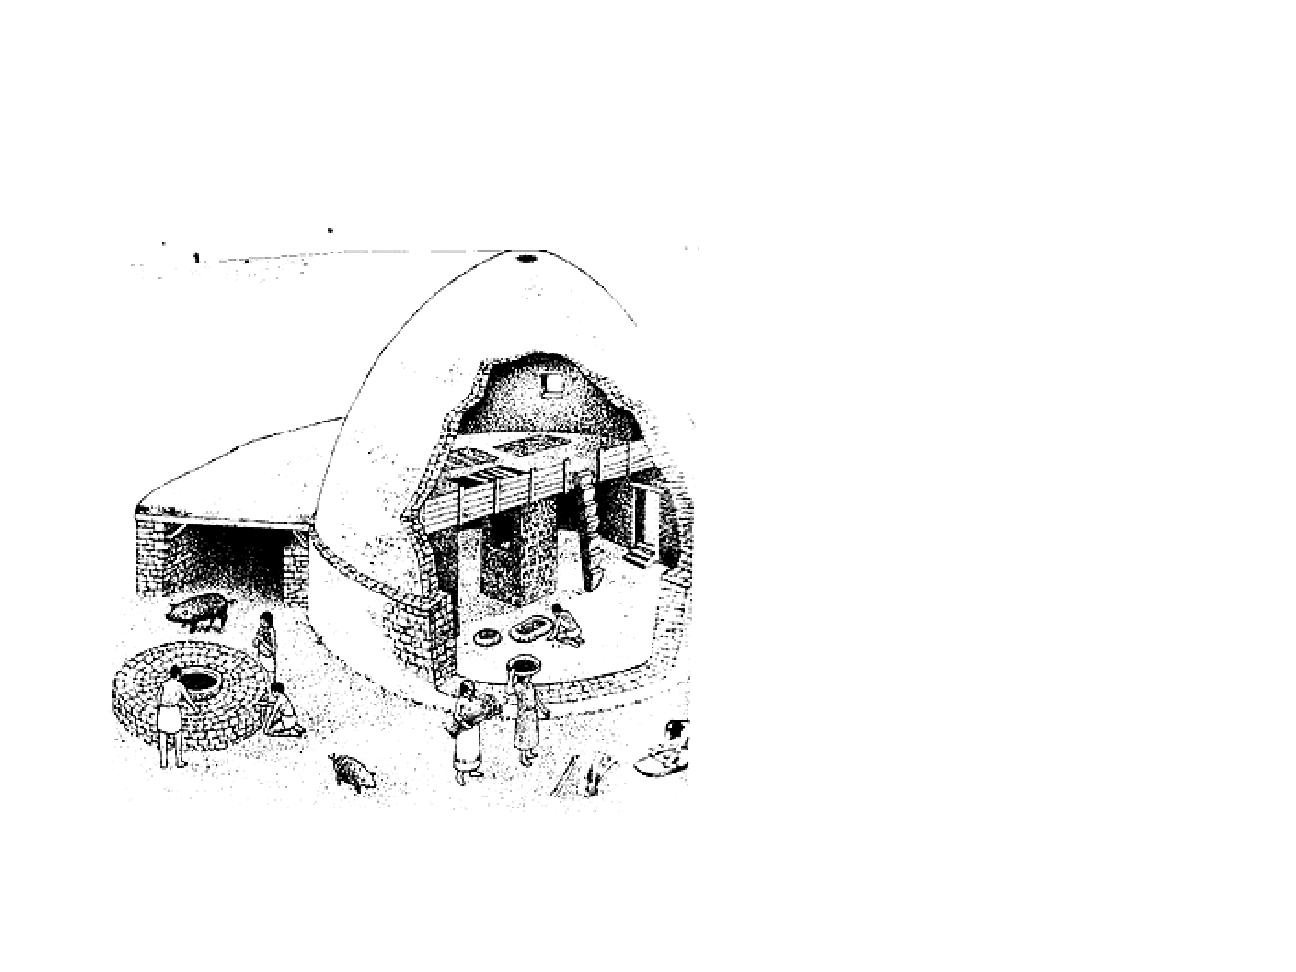 PREHISTORY, Evolution Of Houses